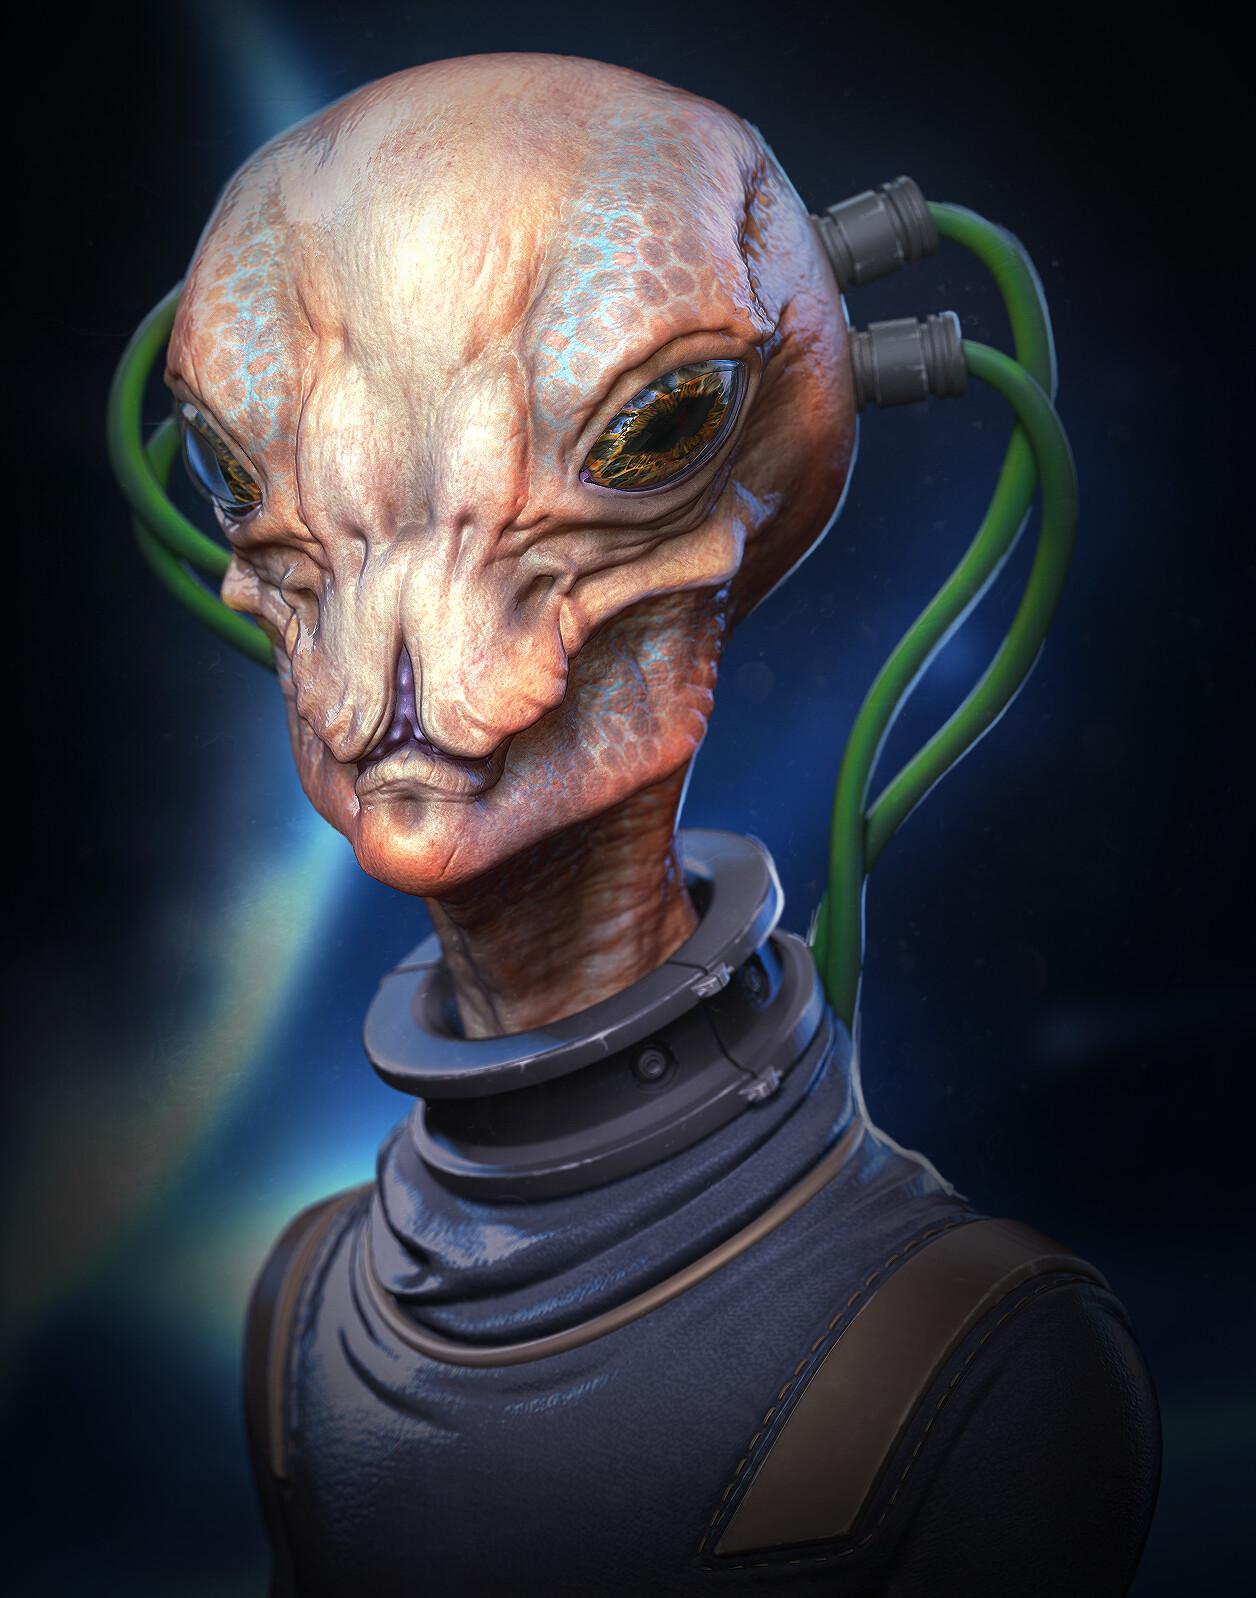 Alien/Creature sculpt